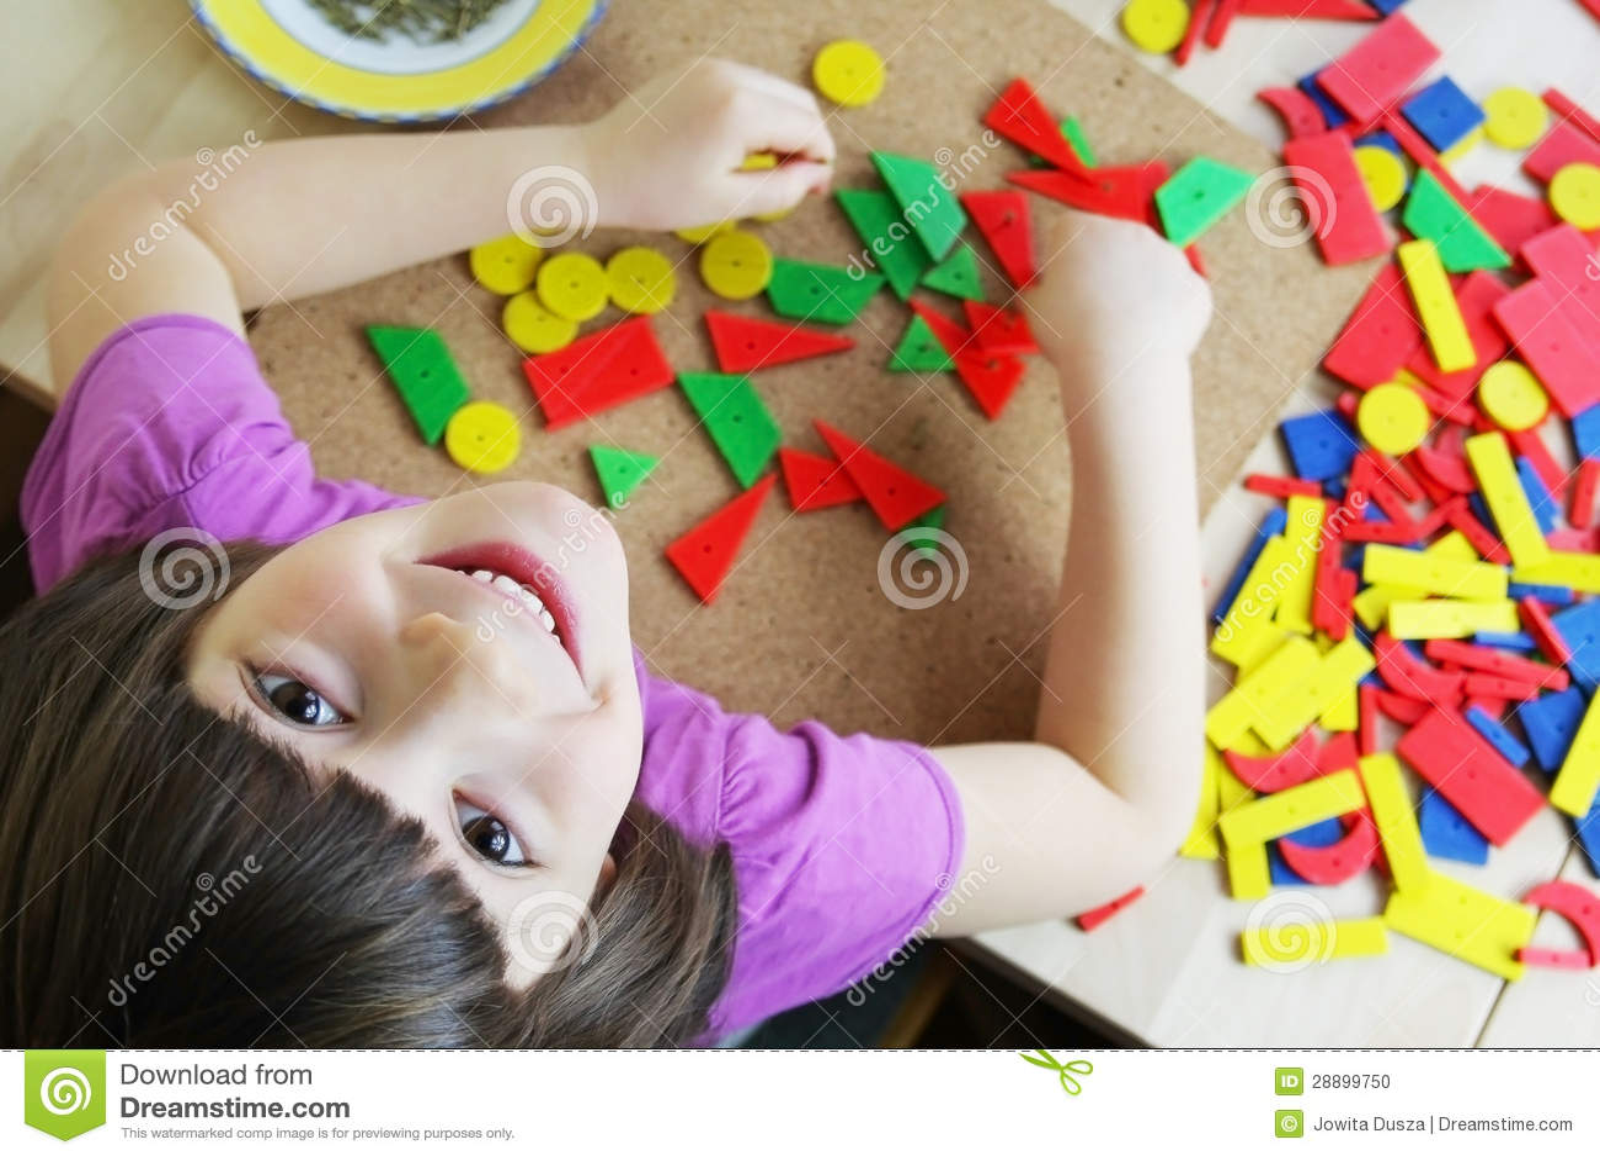 Montessori难题。 幼稚园。